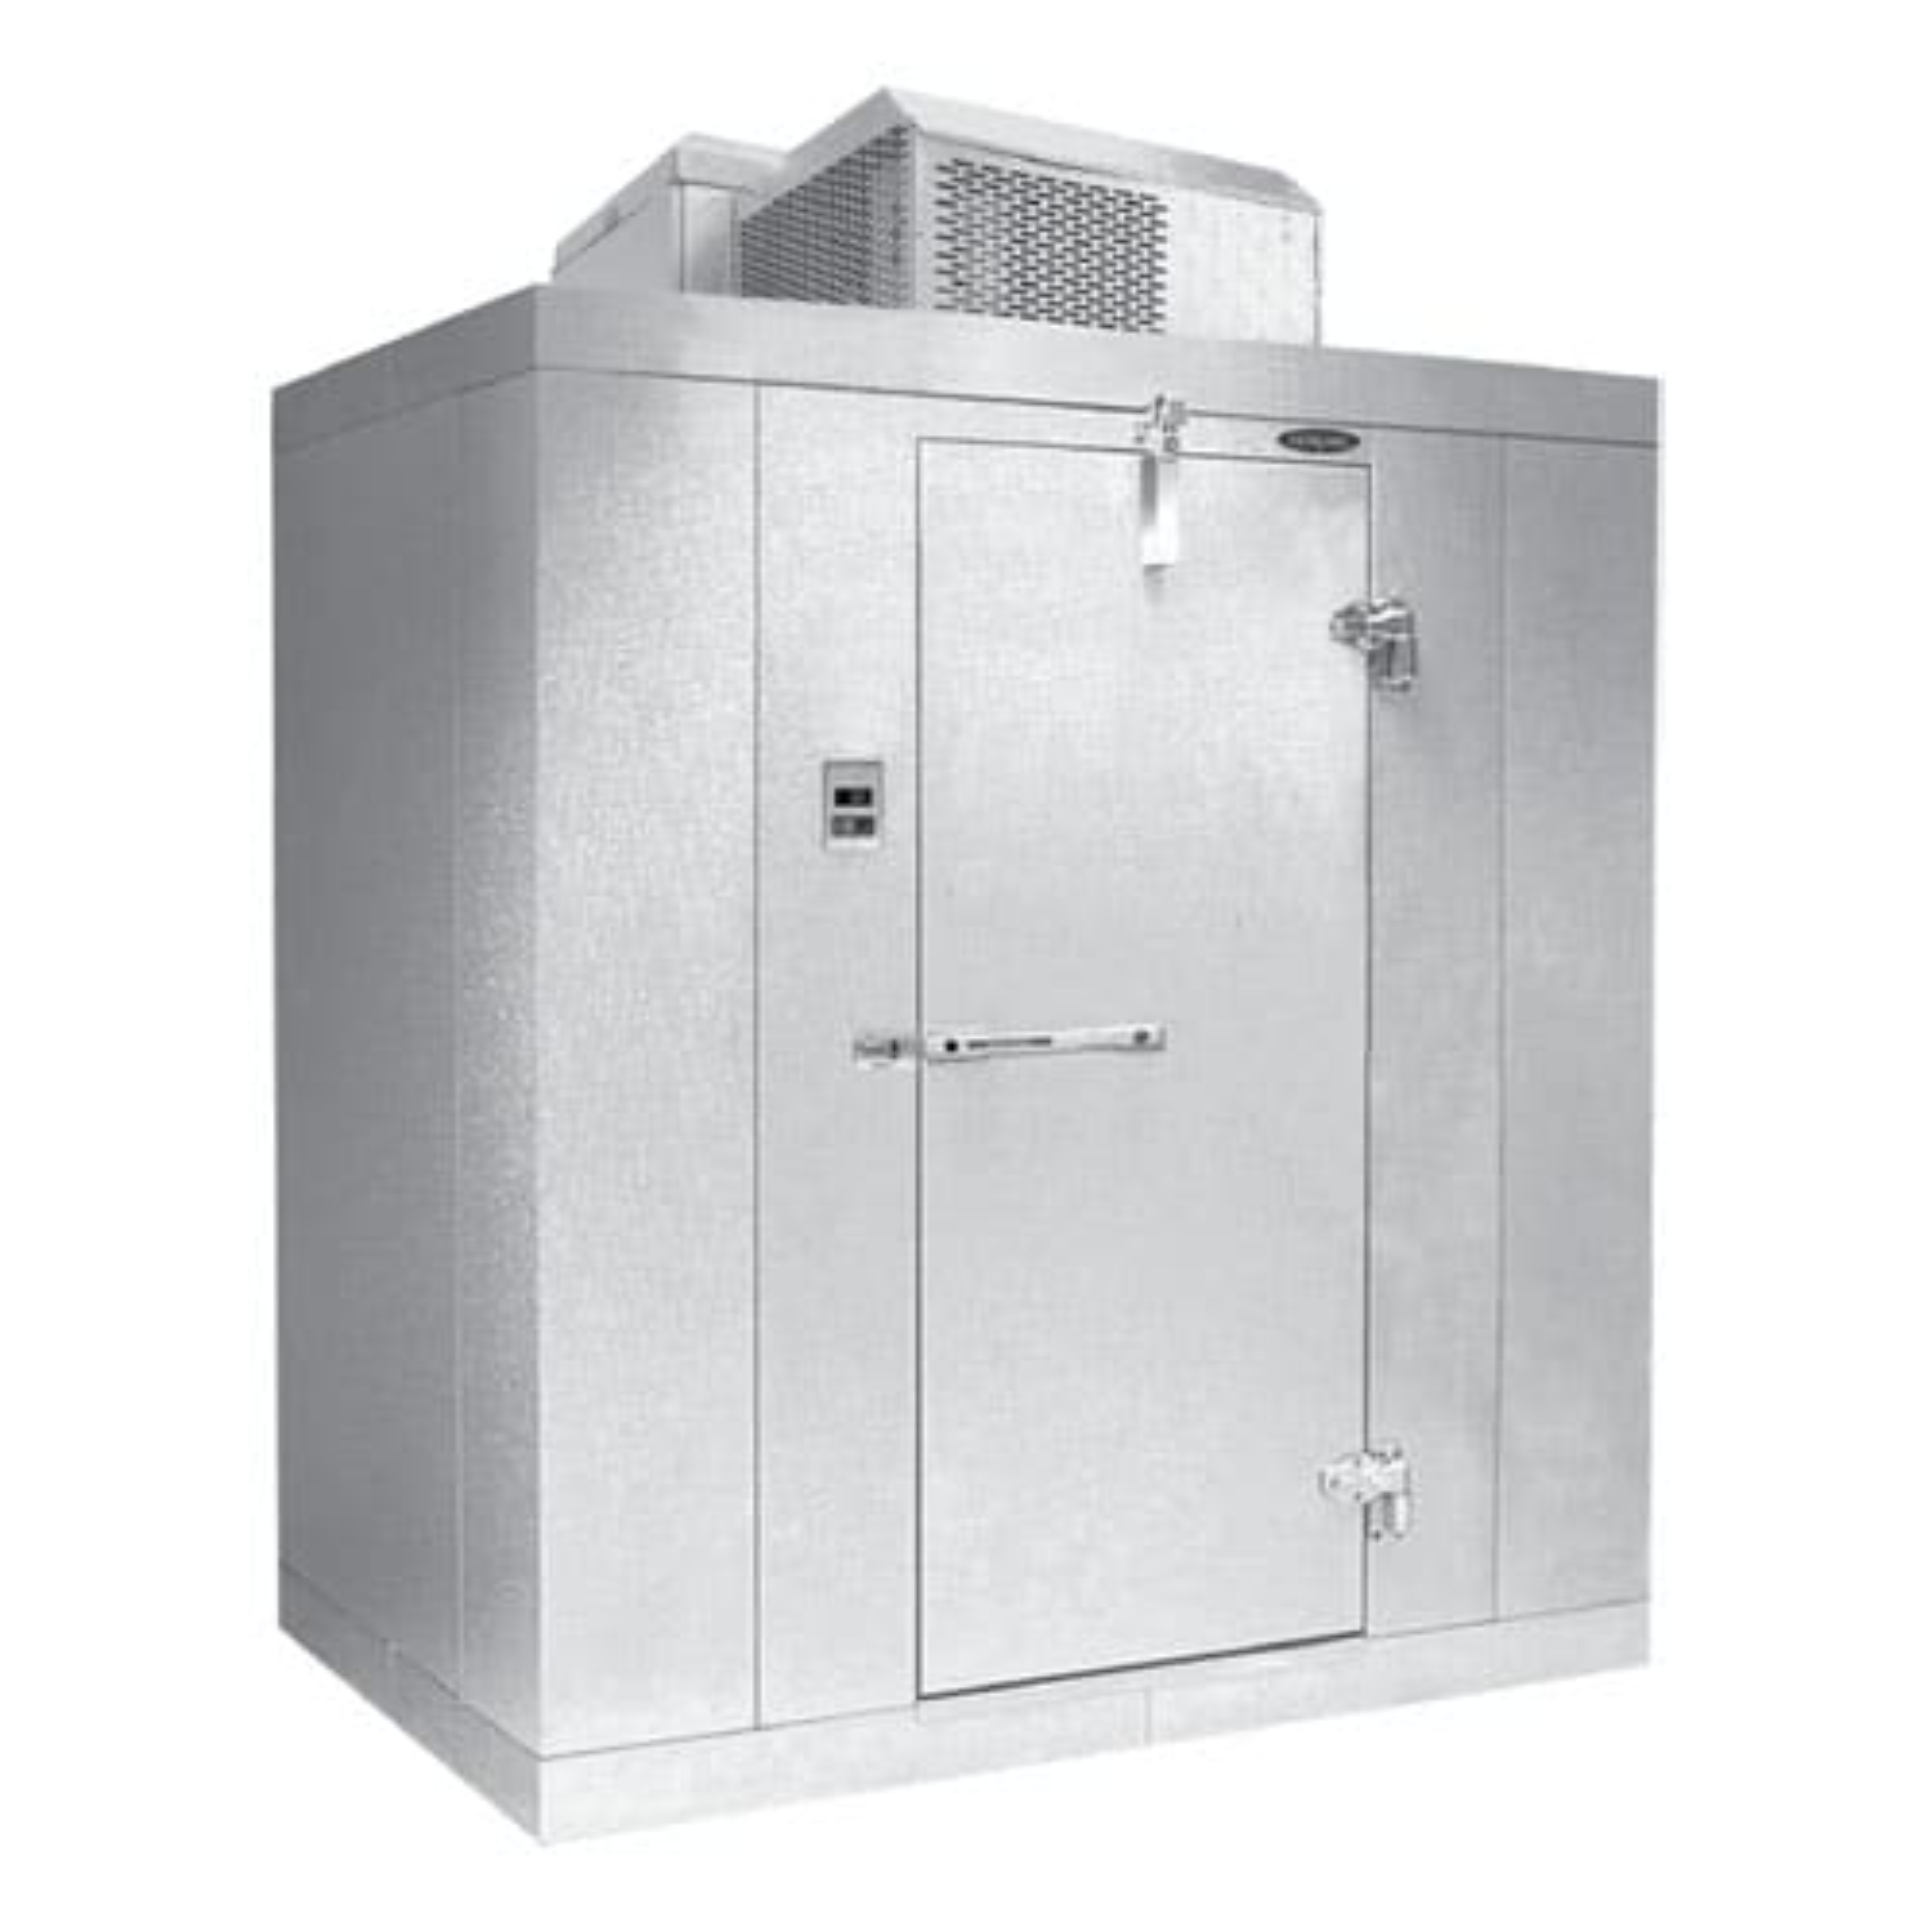 Nor-Lake KLB77810-C L Indoor Walk-In Refrigerator w/ Top ...